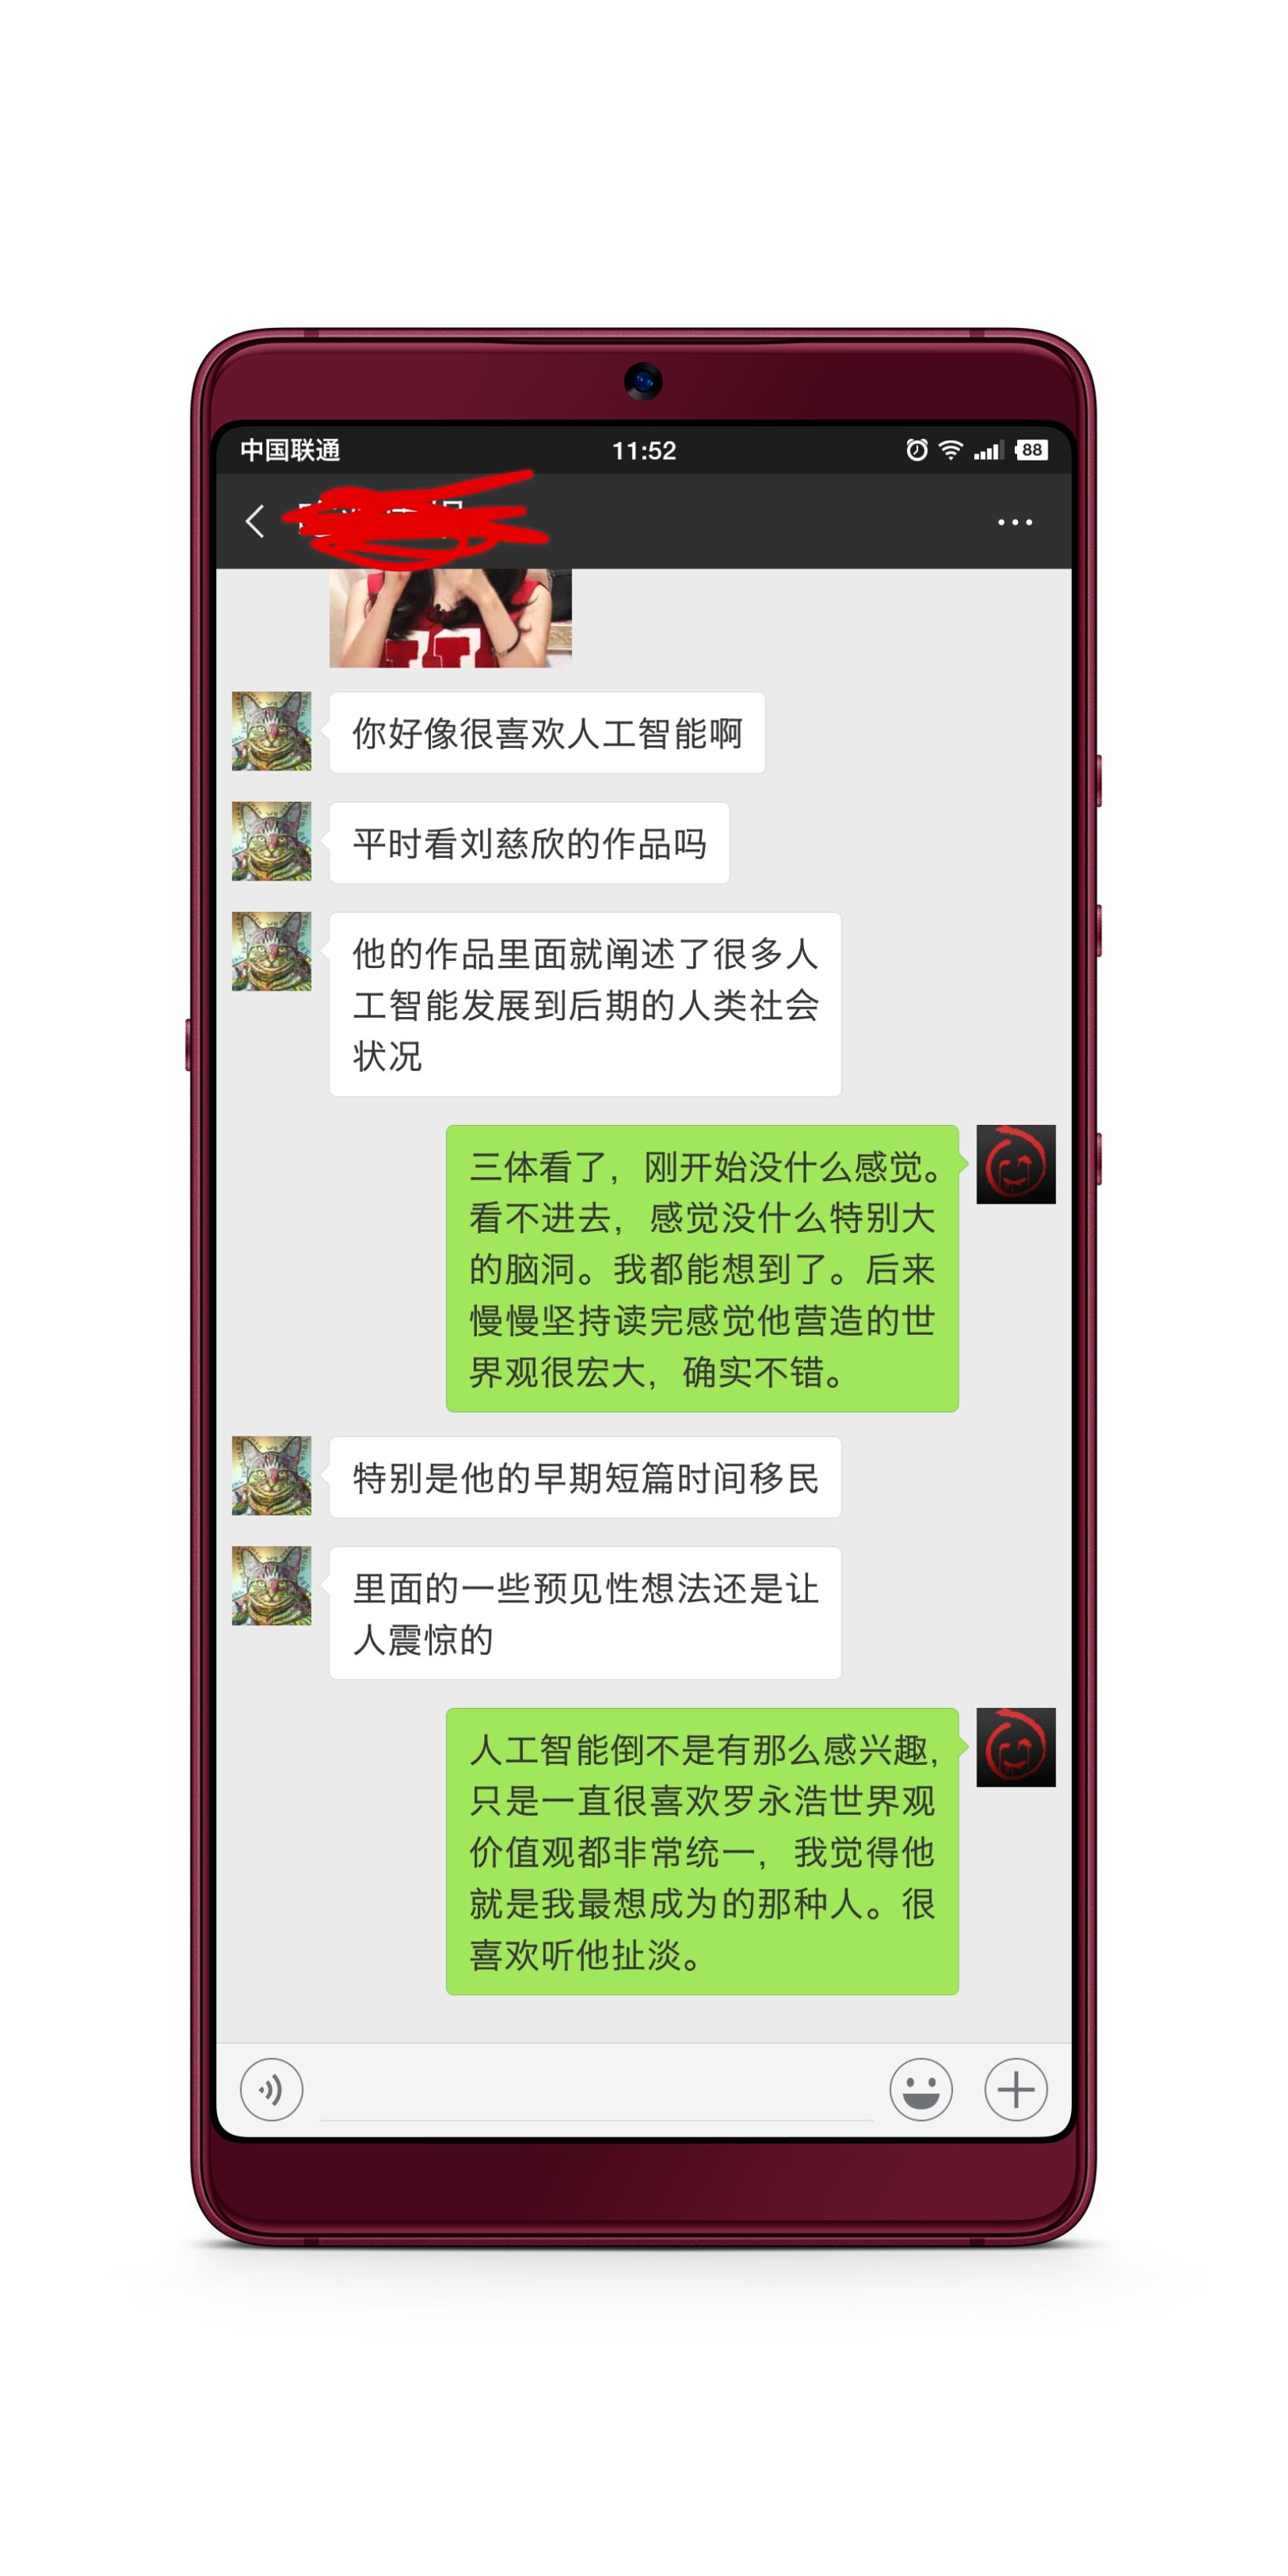 ??_Screenshot_2018-10-31-11-52-12-959_??.png